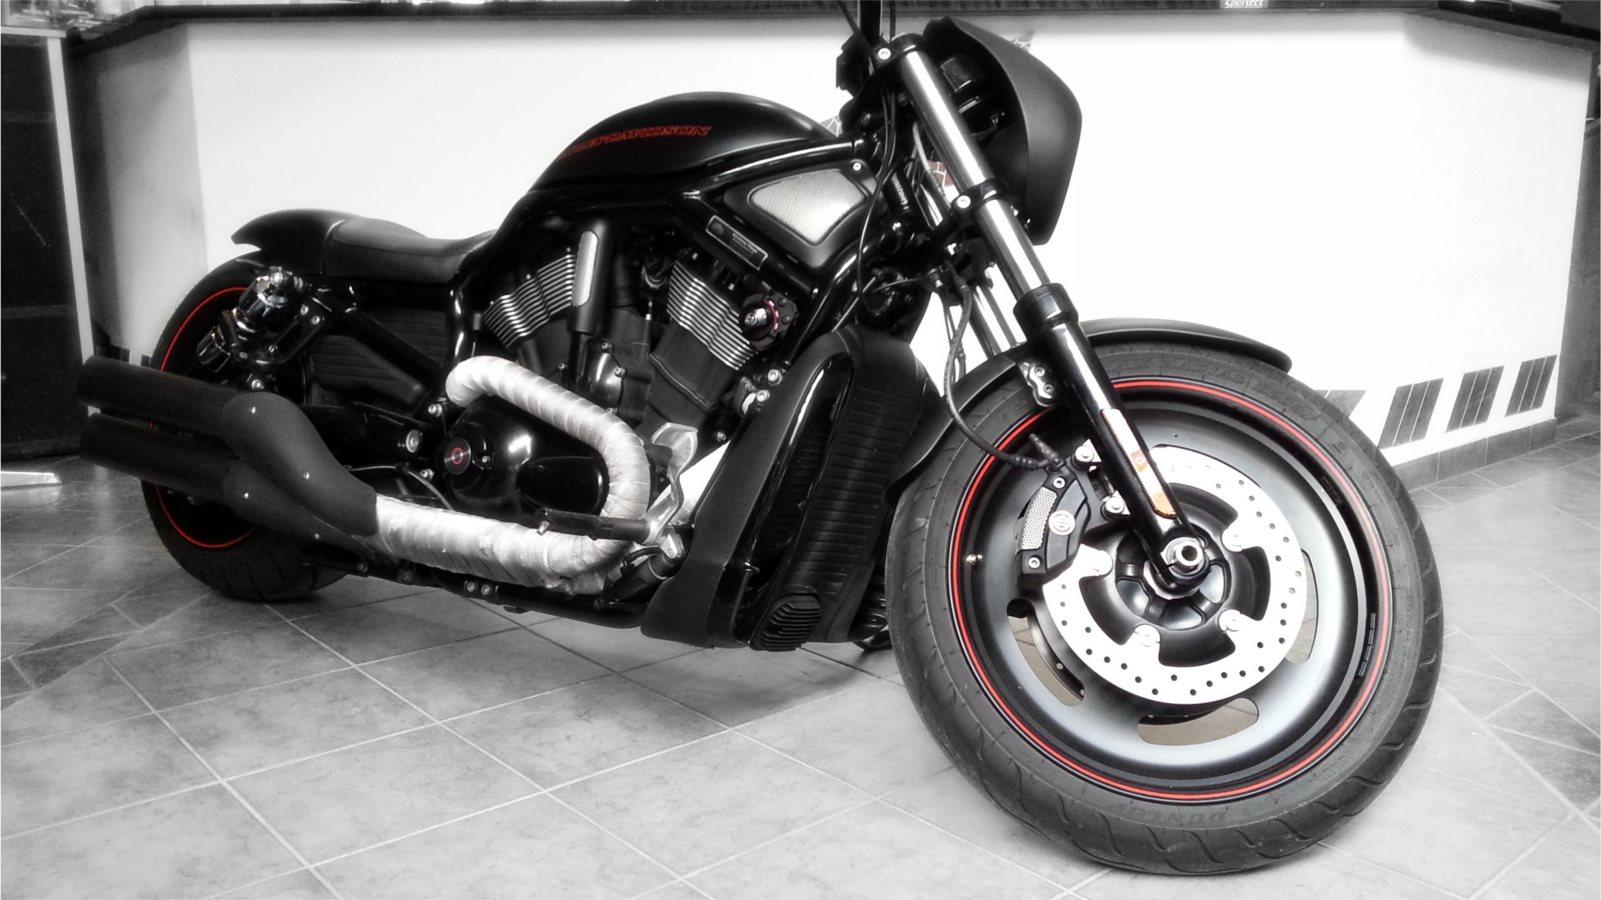 umgebautes motorrad harley davidson v rod night rod vrscd von motorrad kreiselmeyer gmbh. Black Bedroom Furniture Sets. Home Design Ideas